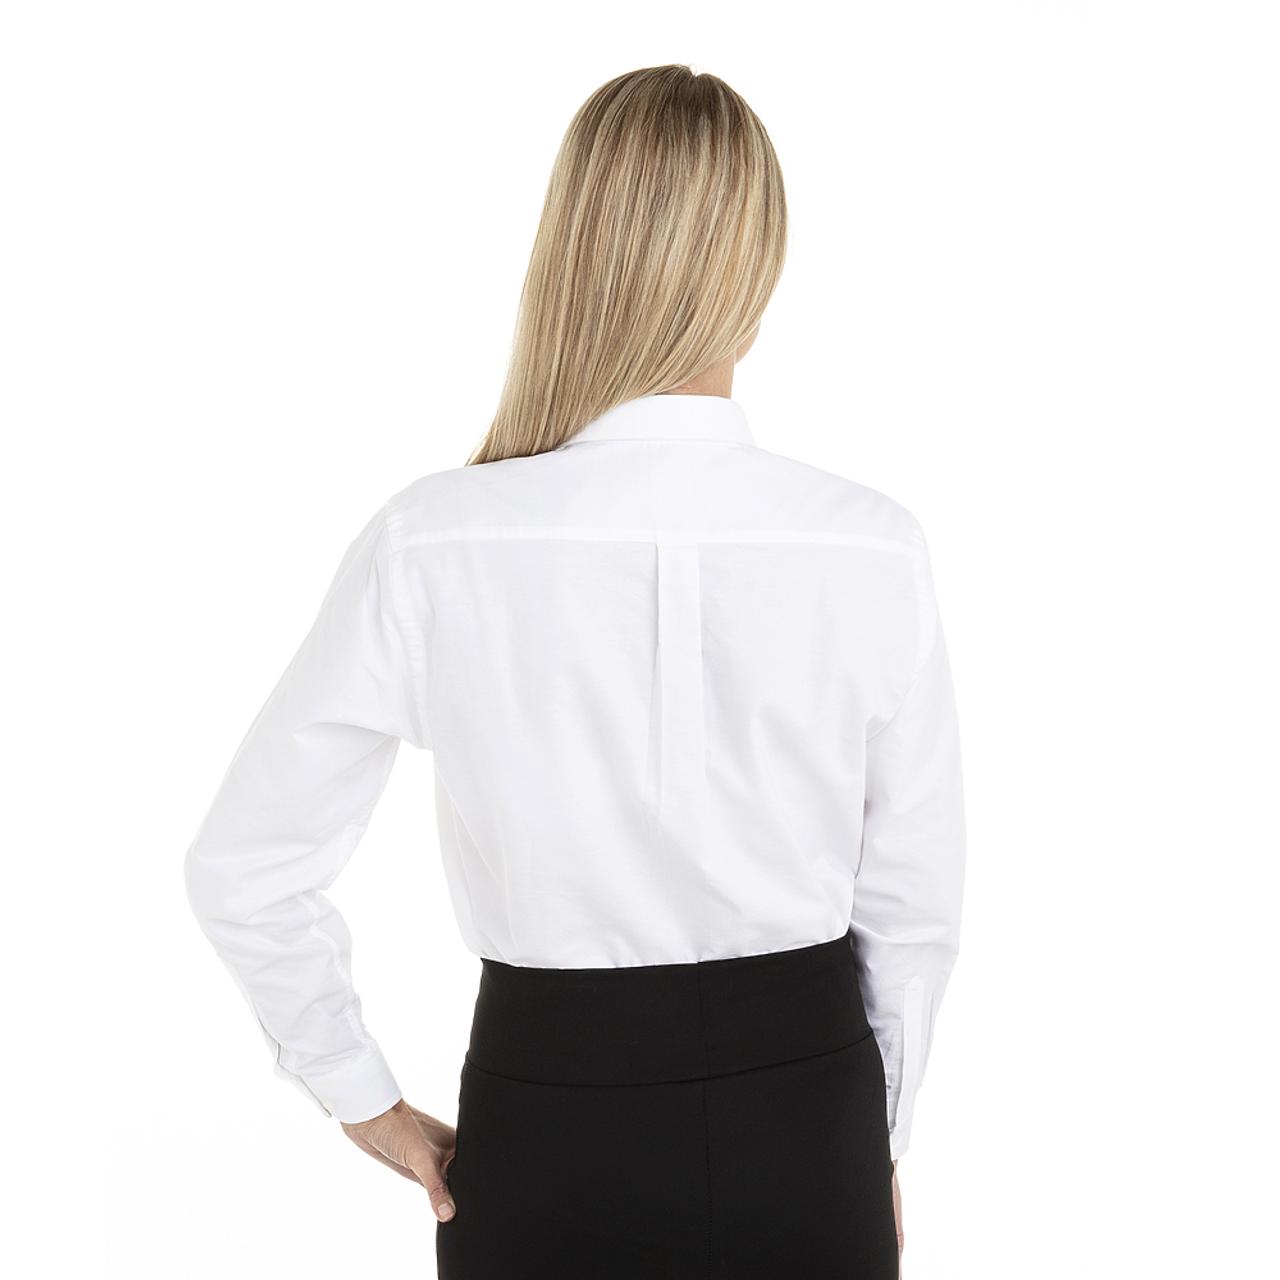 White - Back, 18CV300 Van Heusen Ladies' Long Sleeve Oxford Shirt | T-shirt.ca